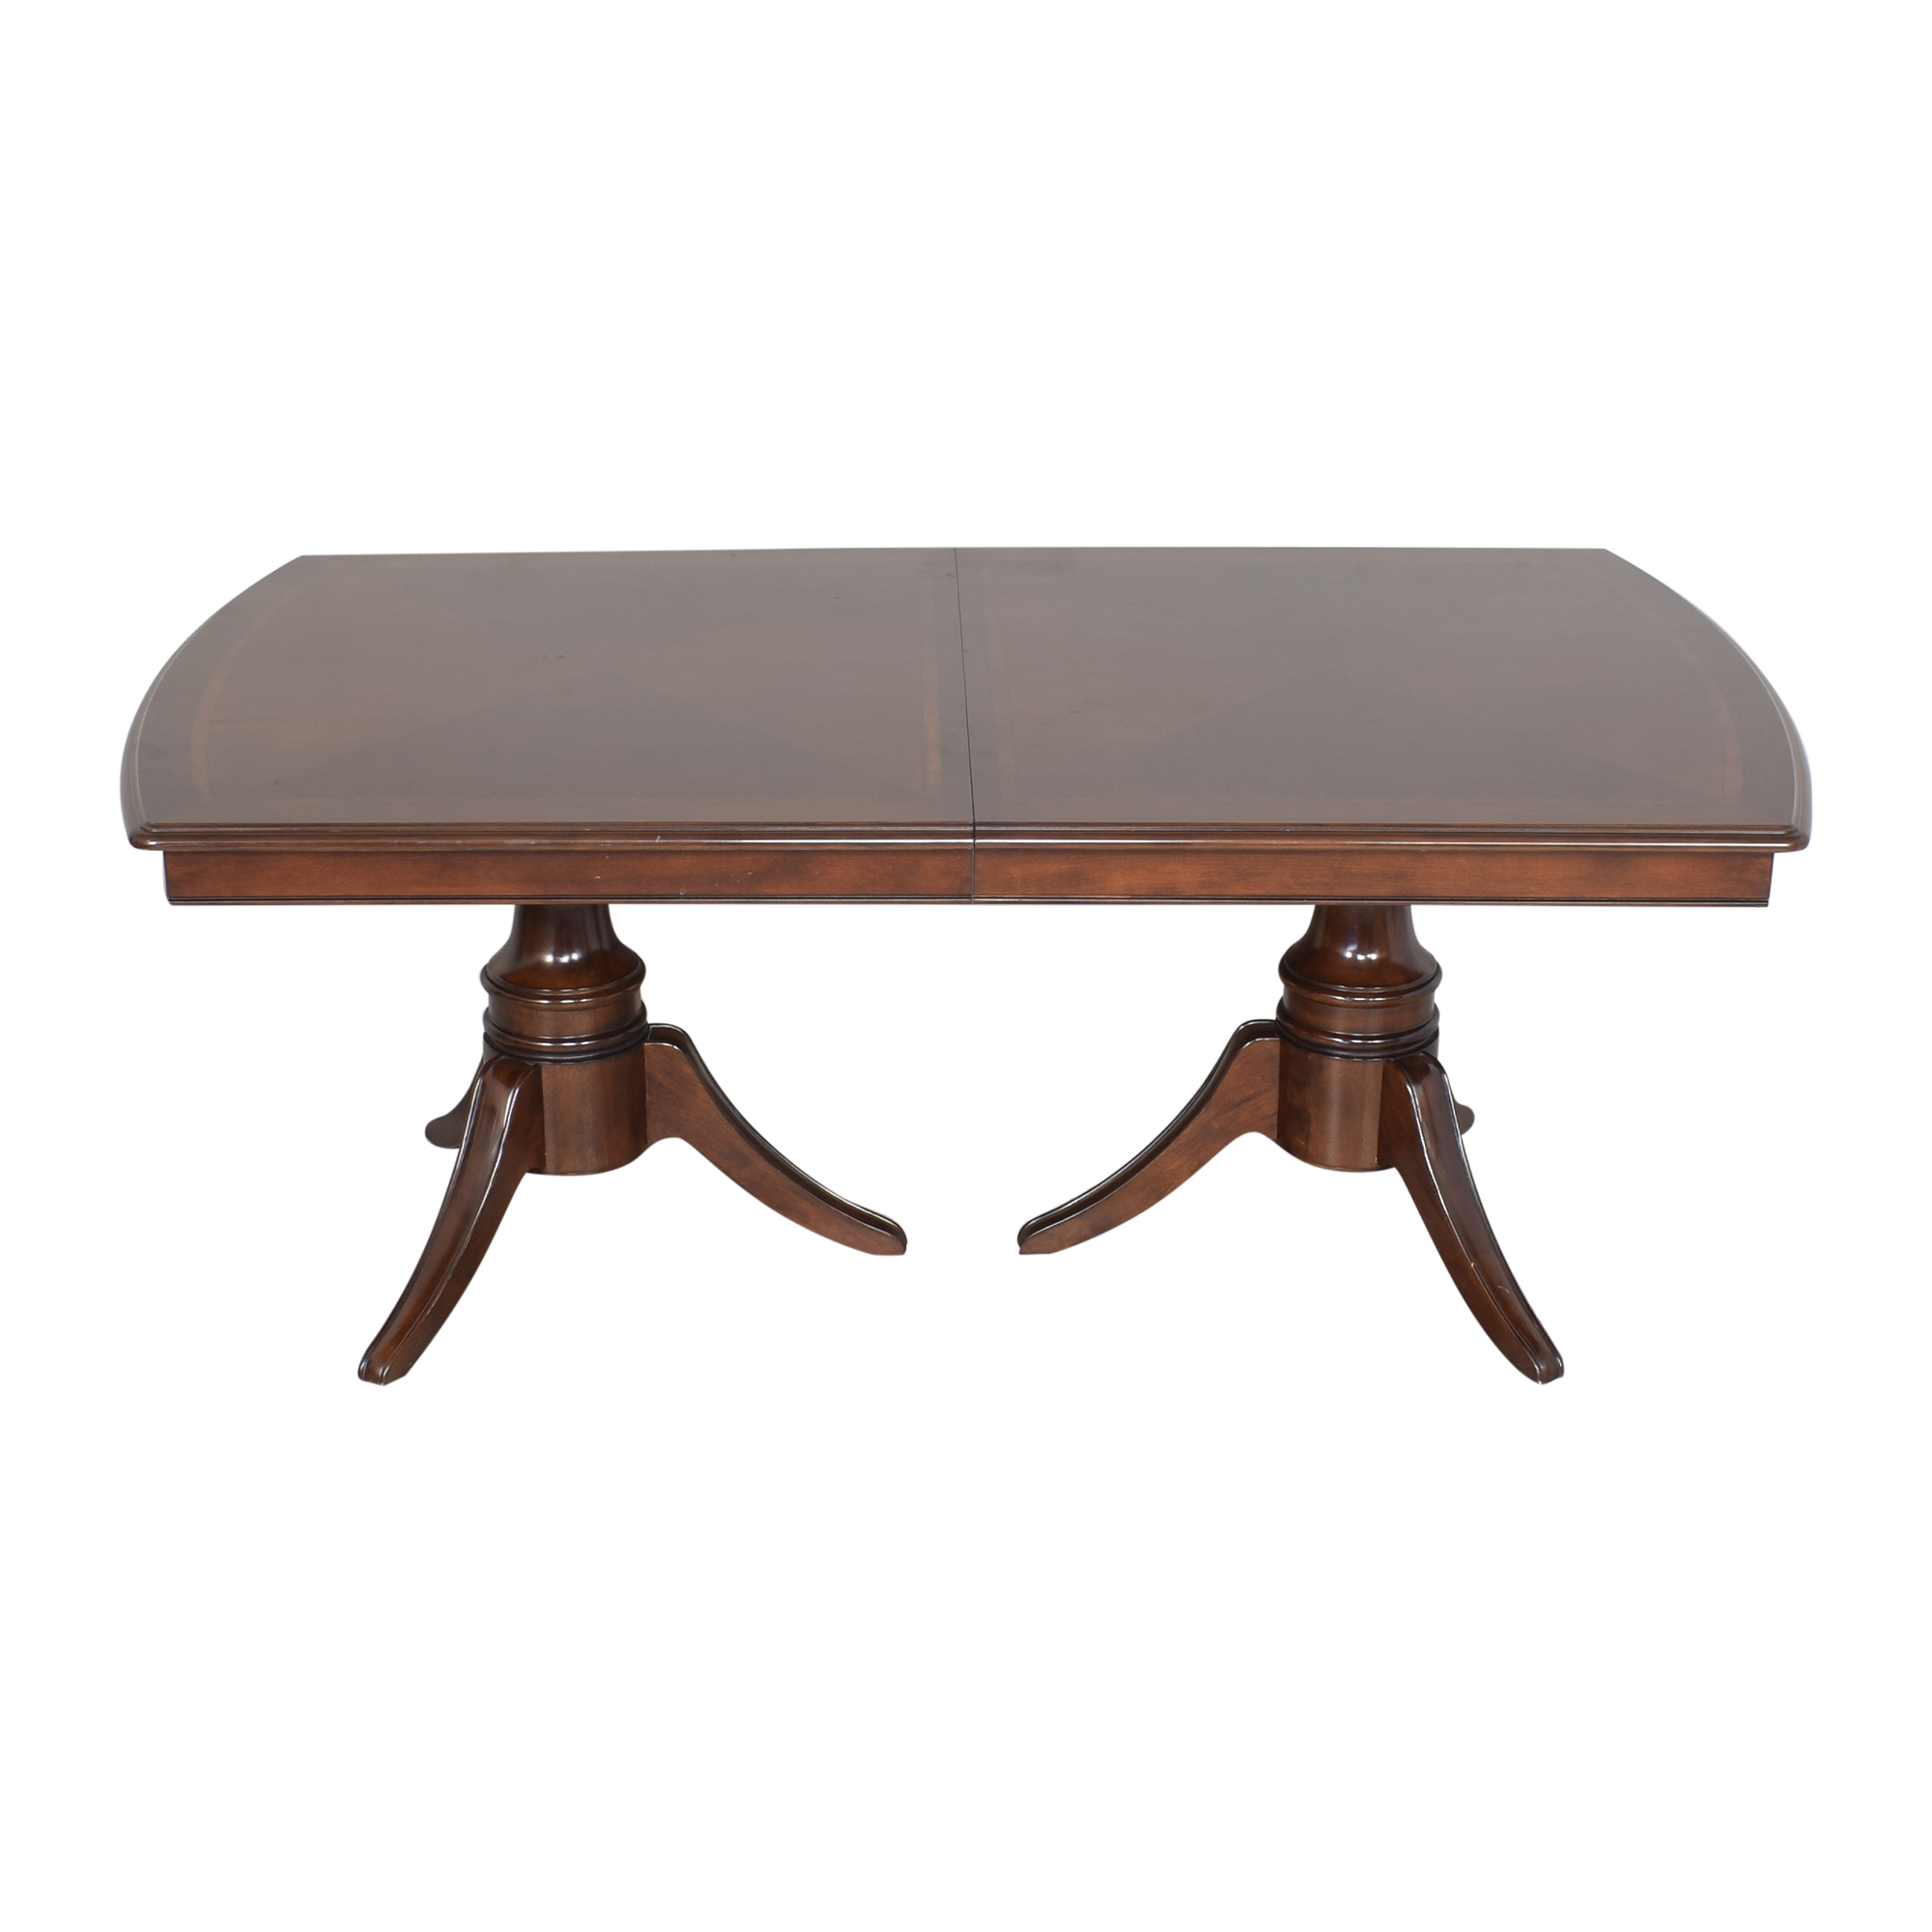 shop Raymour & Flanigan Double Pedestal Extendable Dining Table Raymour & Flanigan Tables